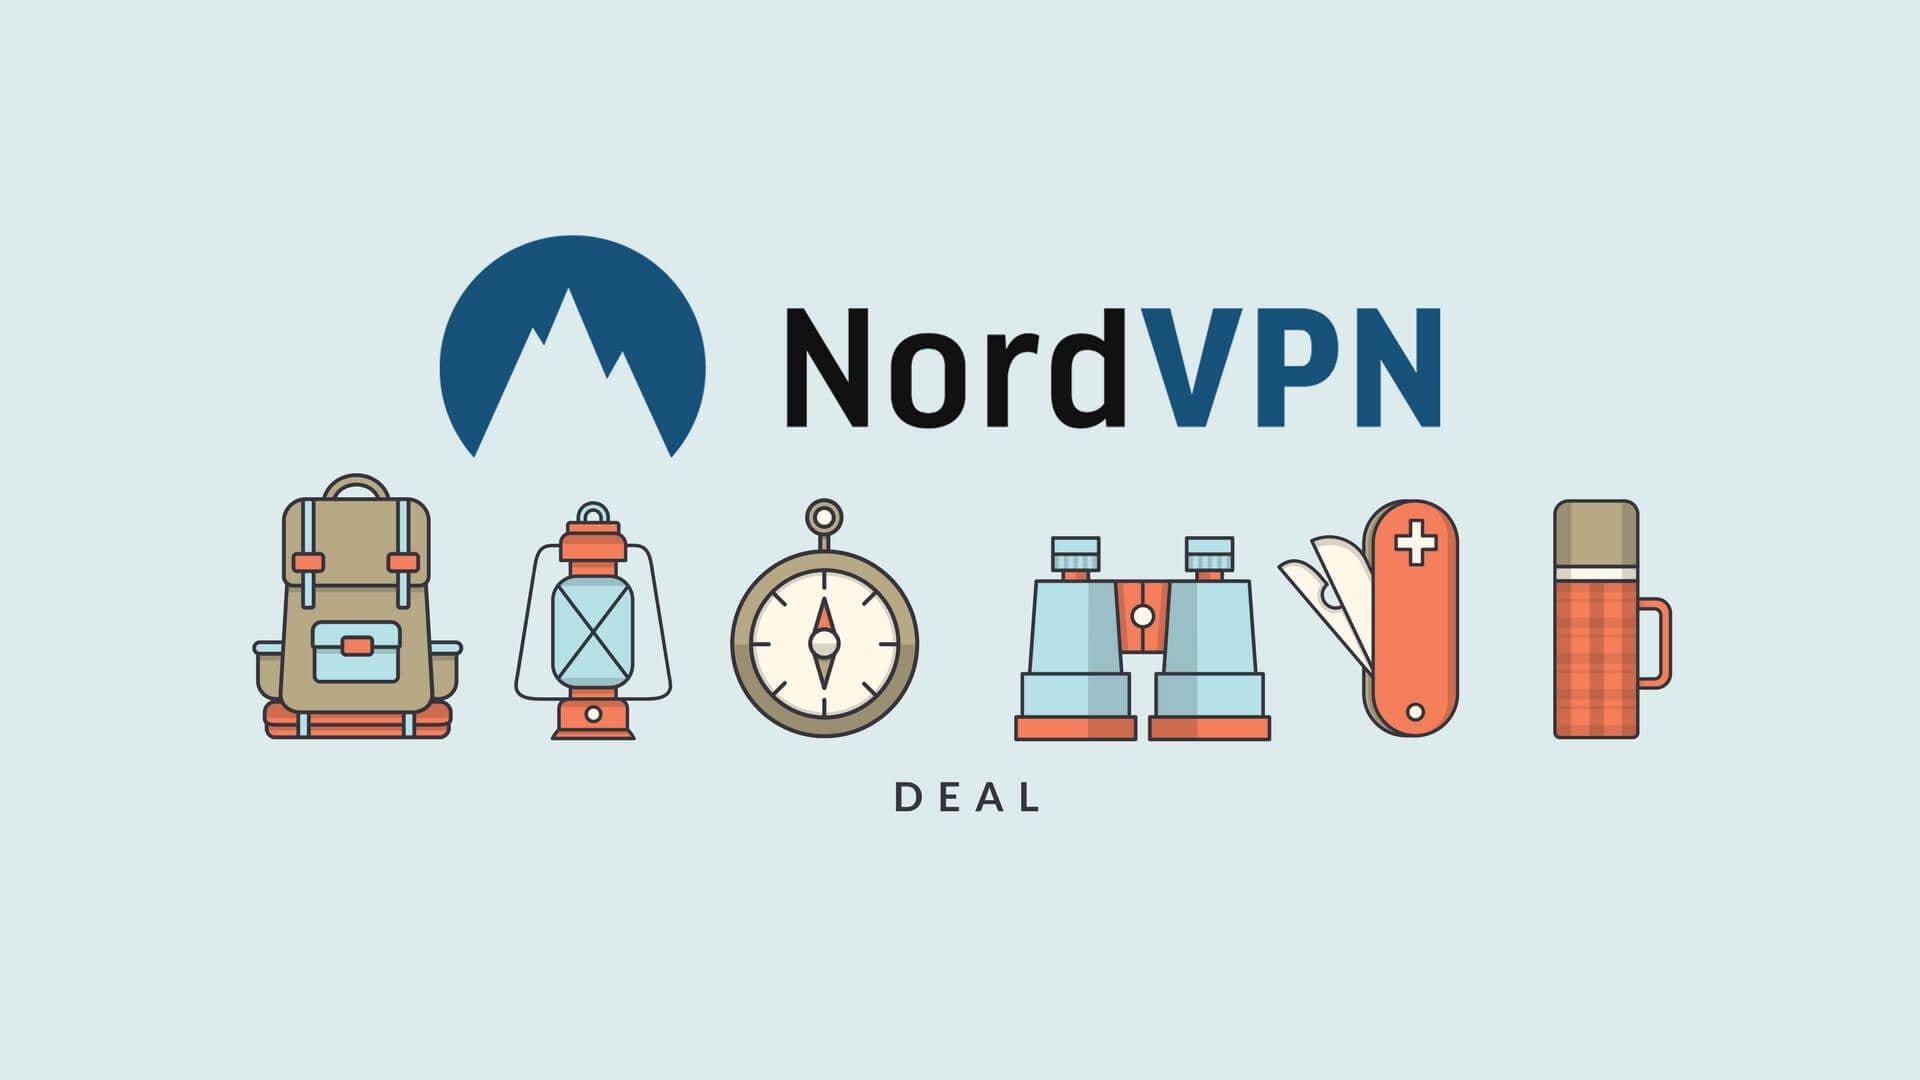 NordVPN Deal